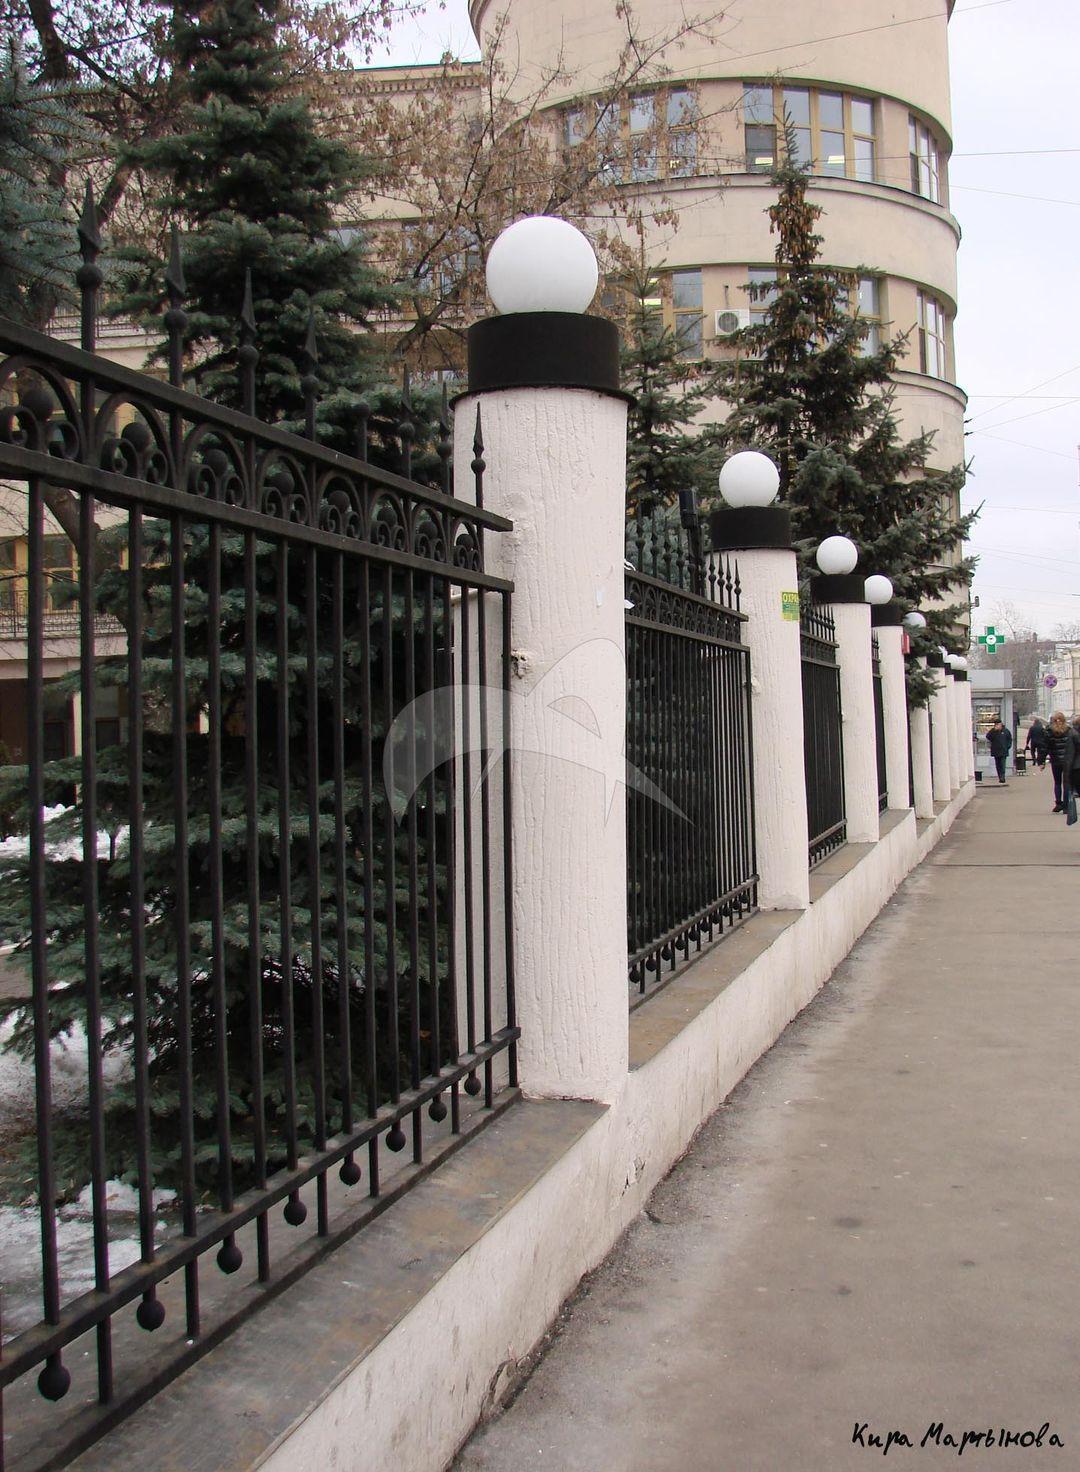 Ограда, поликлиника Наркомата путей сообщения (МПС), 1923-1933 гг., арх. И.А. Фомин